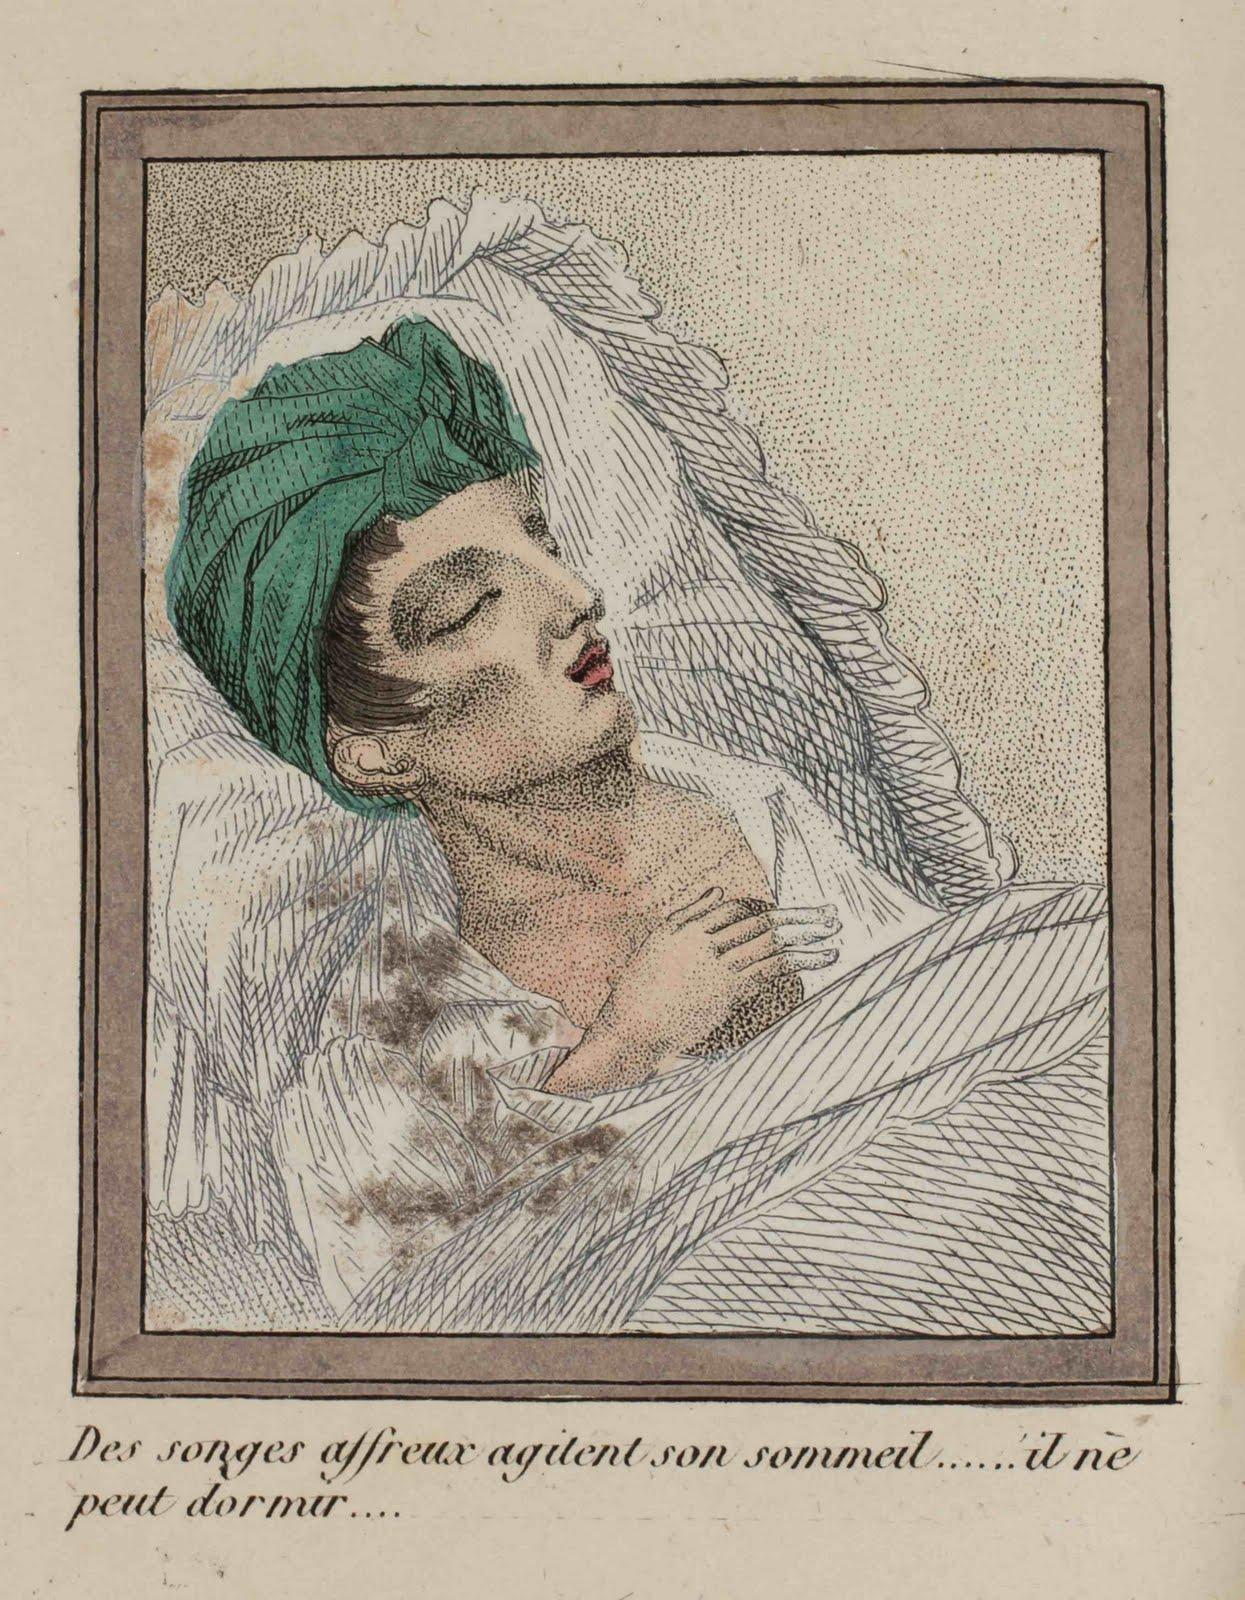 Hideous dreams disturb his slumber... he cannot sleep...